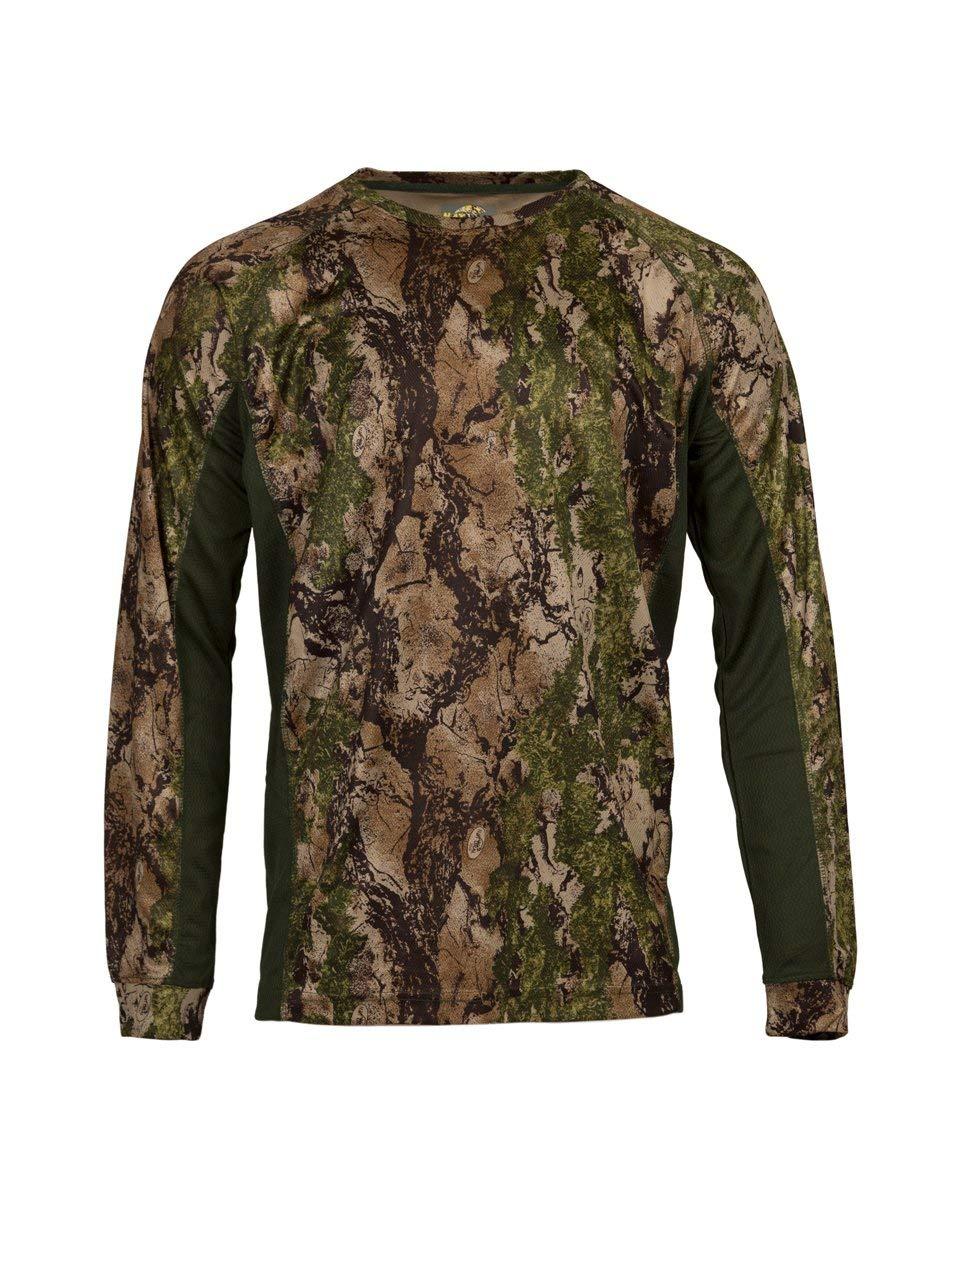 c547df8427617 Get Quotations · Natural Gear Cool Tech Performance Top SC2, Camo Long  Sleeve T-Shirt, Camo